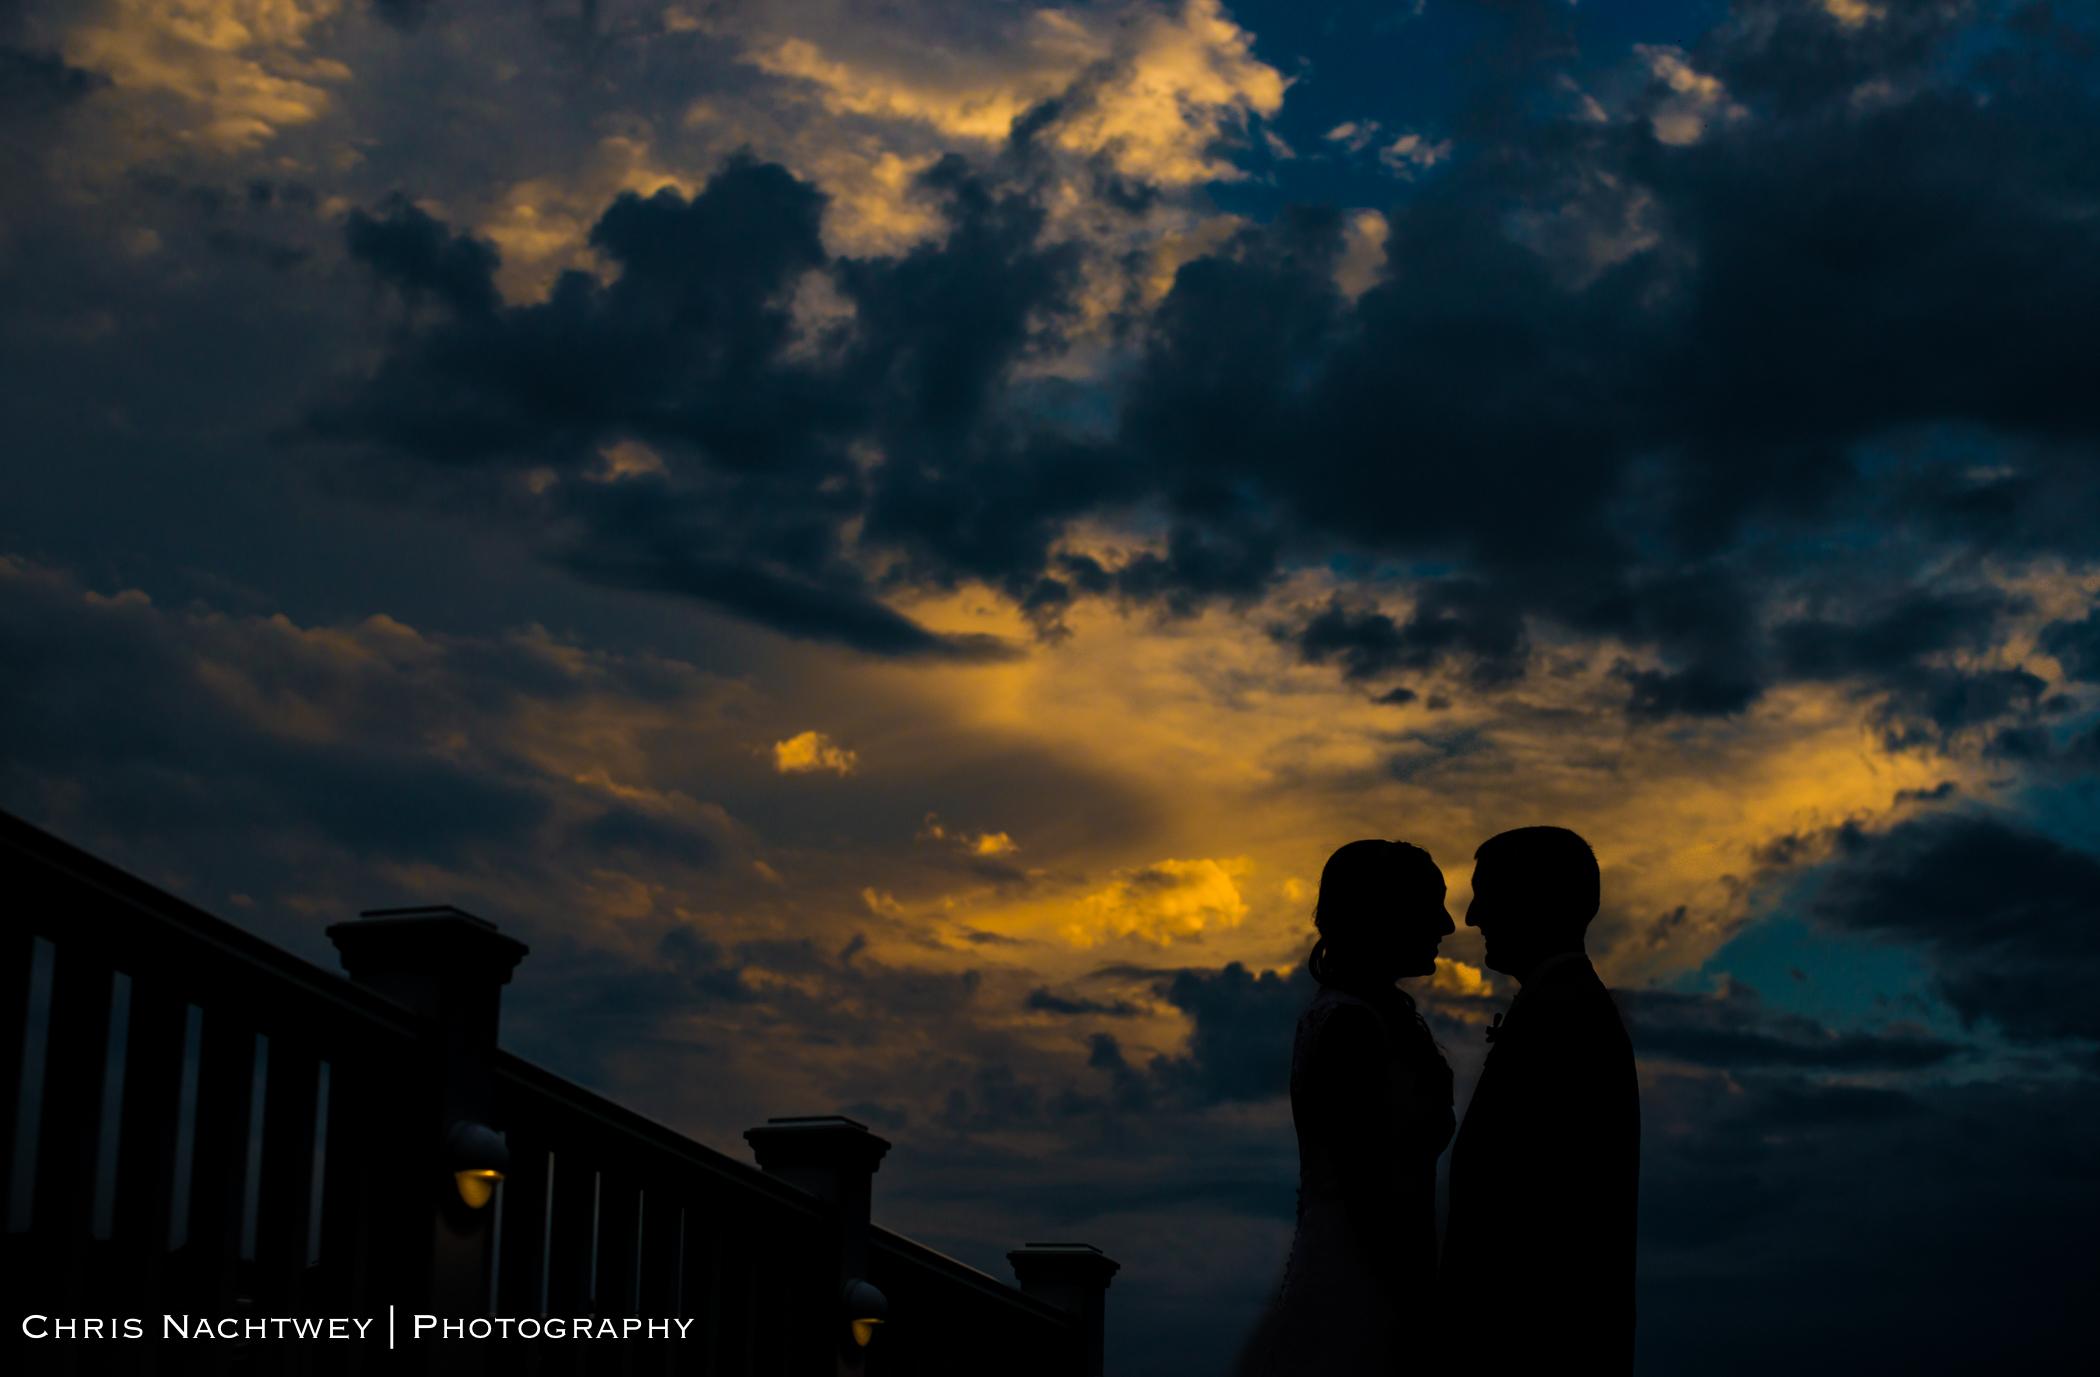 artistic-ct-wedding-photographers-chris-nachtwey-2017-2.jpg